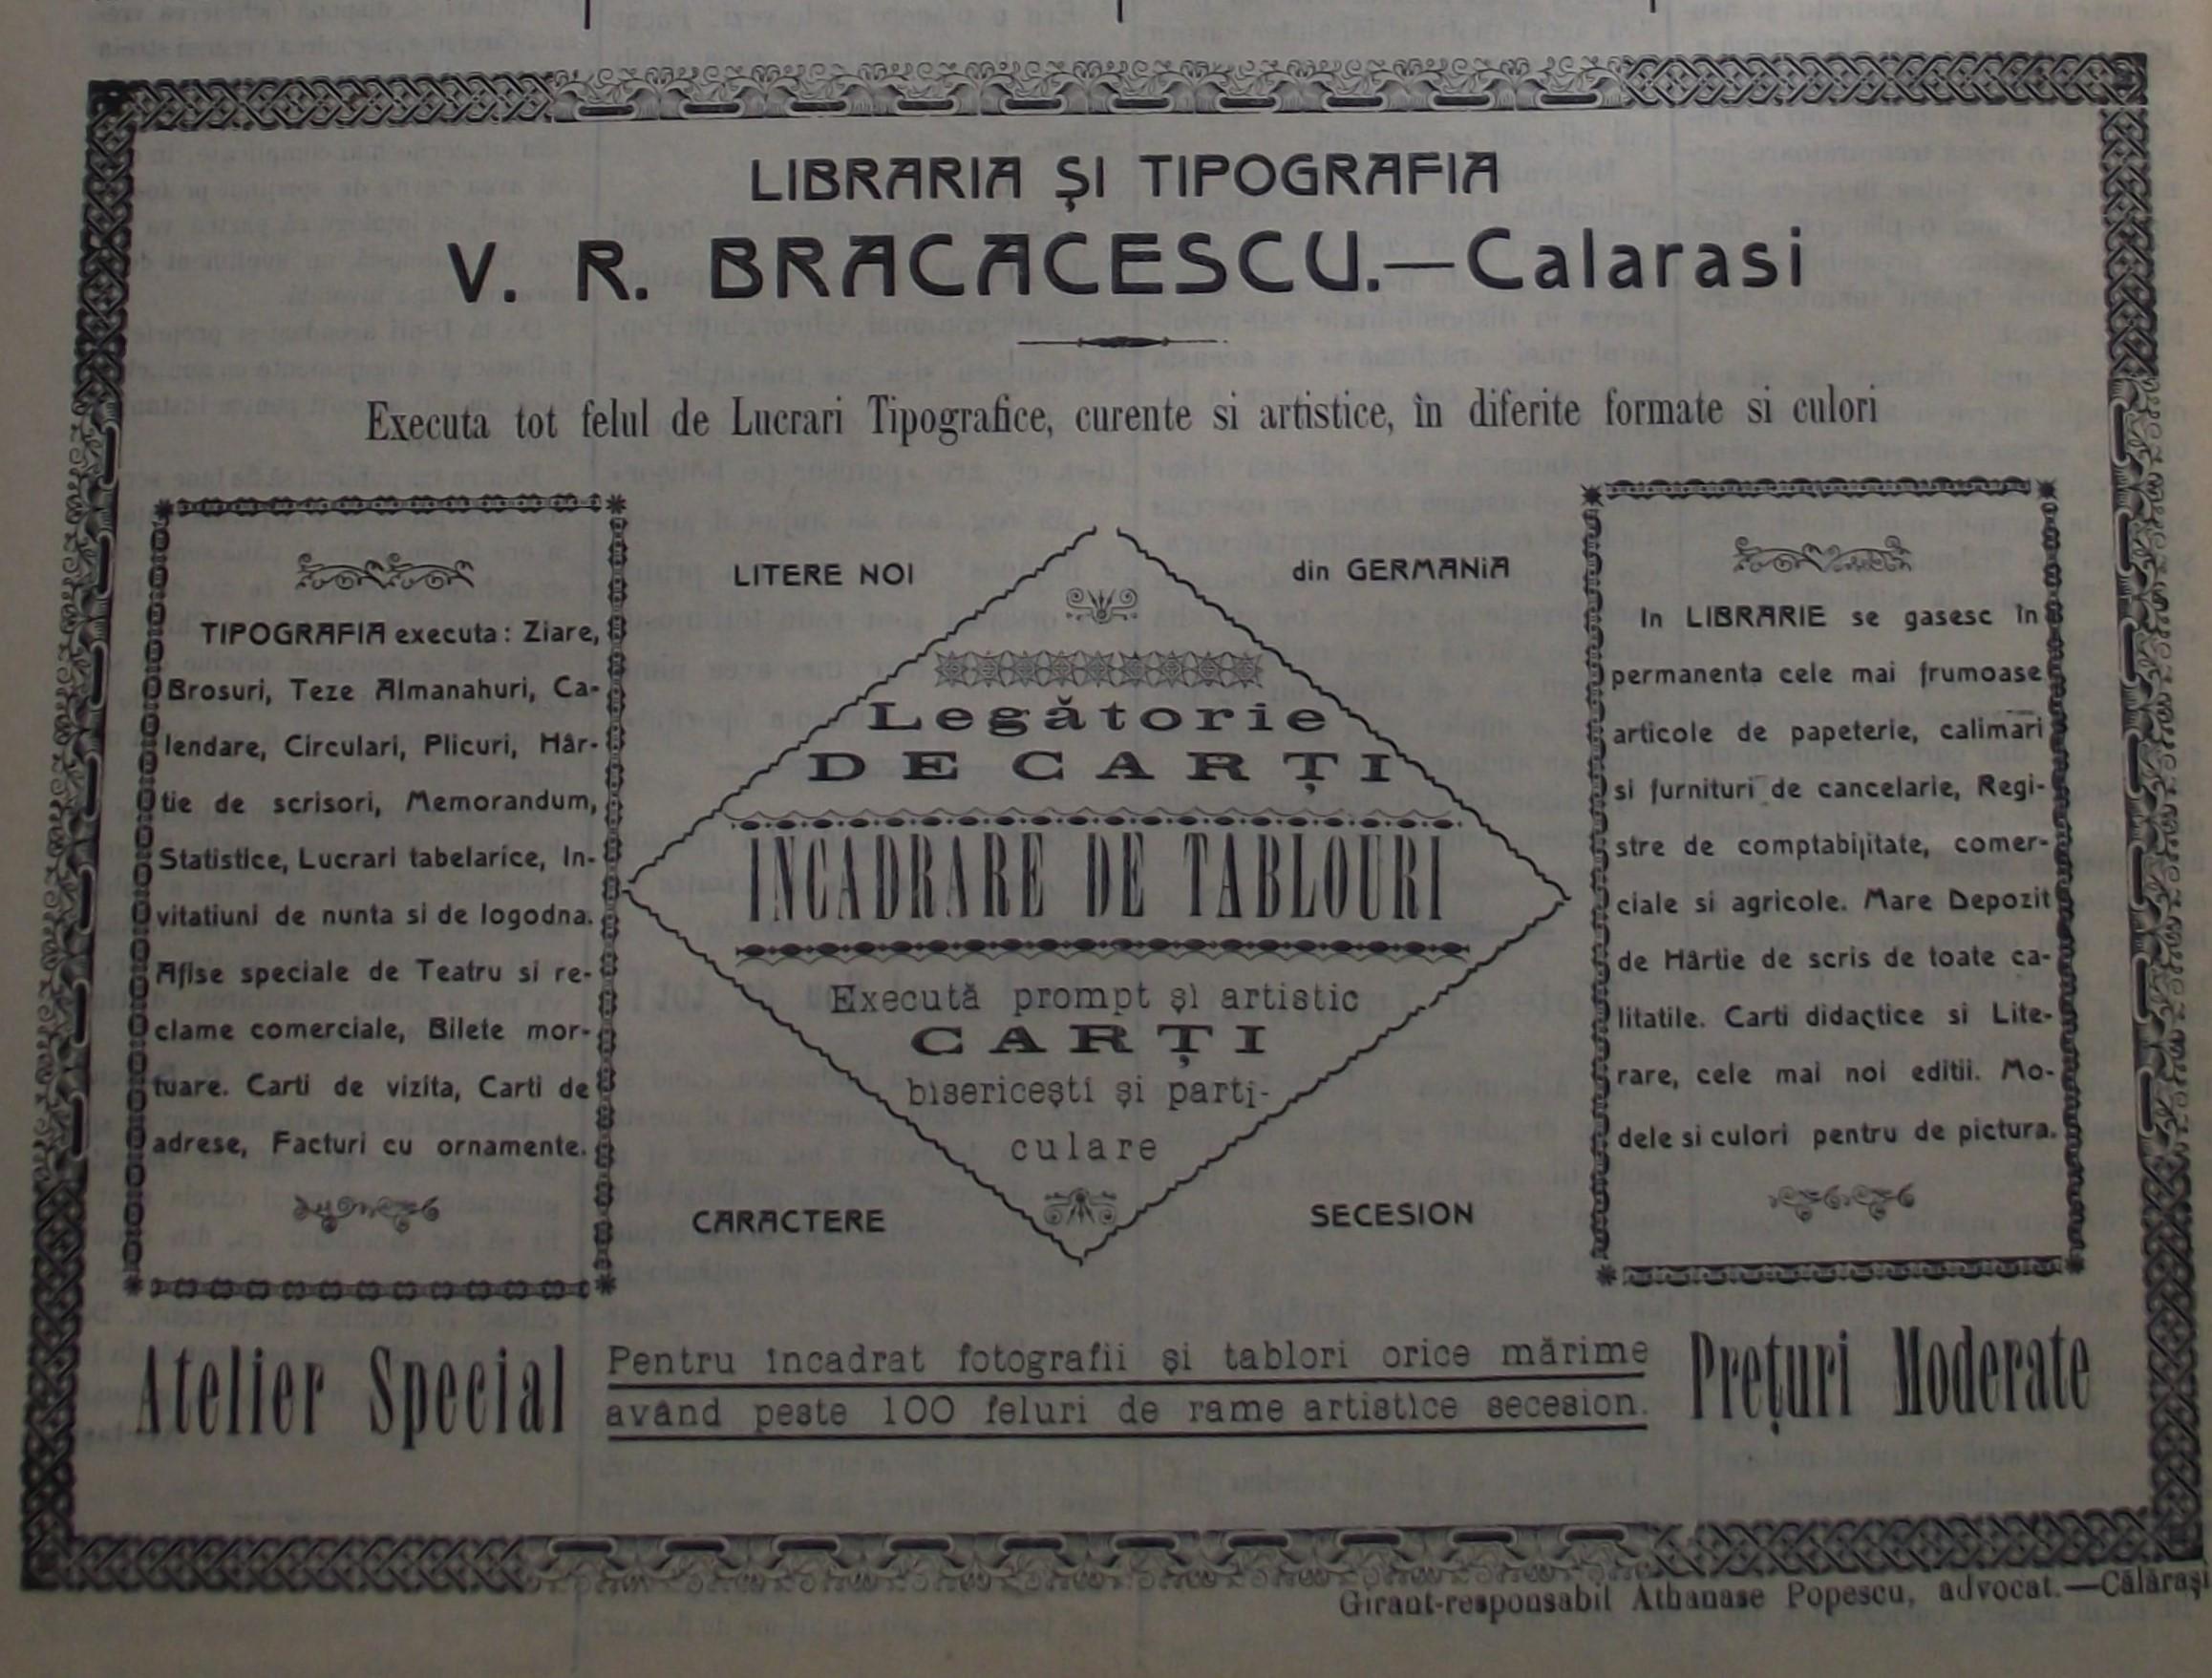 V.R. Bracacescu